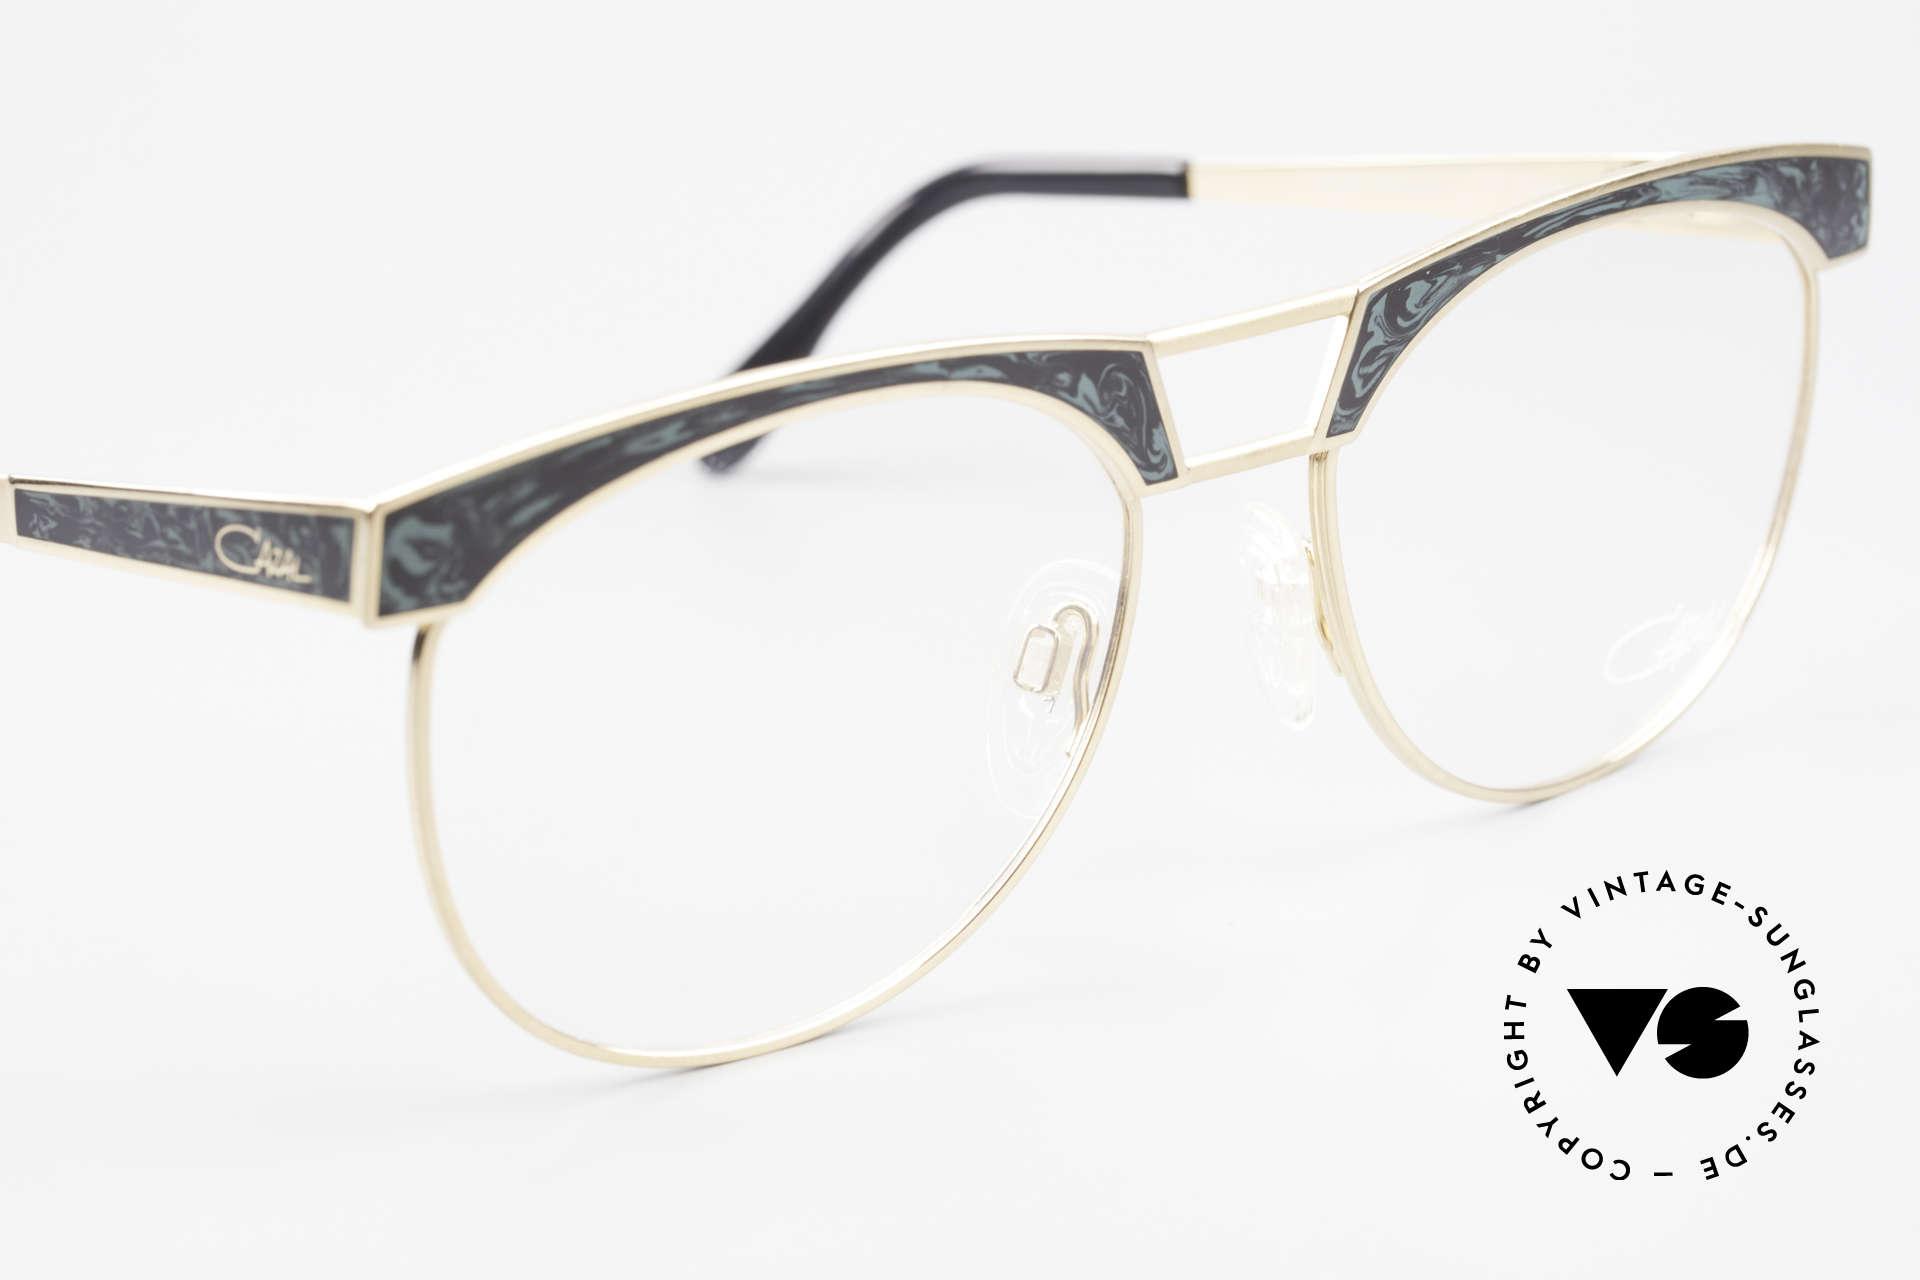 Cazal 741 Panto Style 90's Eyeglasses, unworn (like all our rare vintage eyeglasses by CAZAL), Made for Men